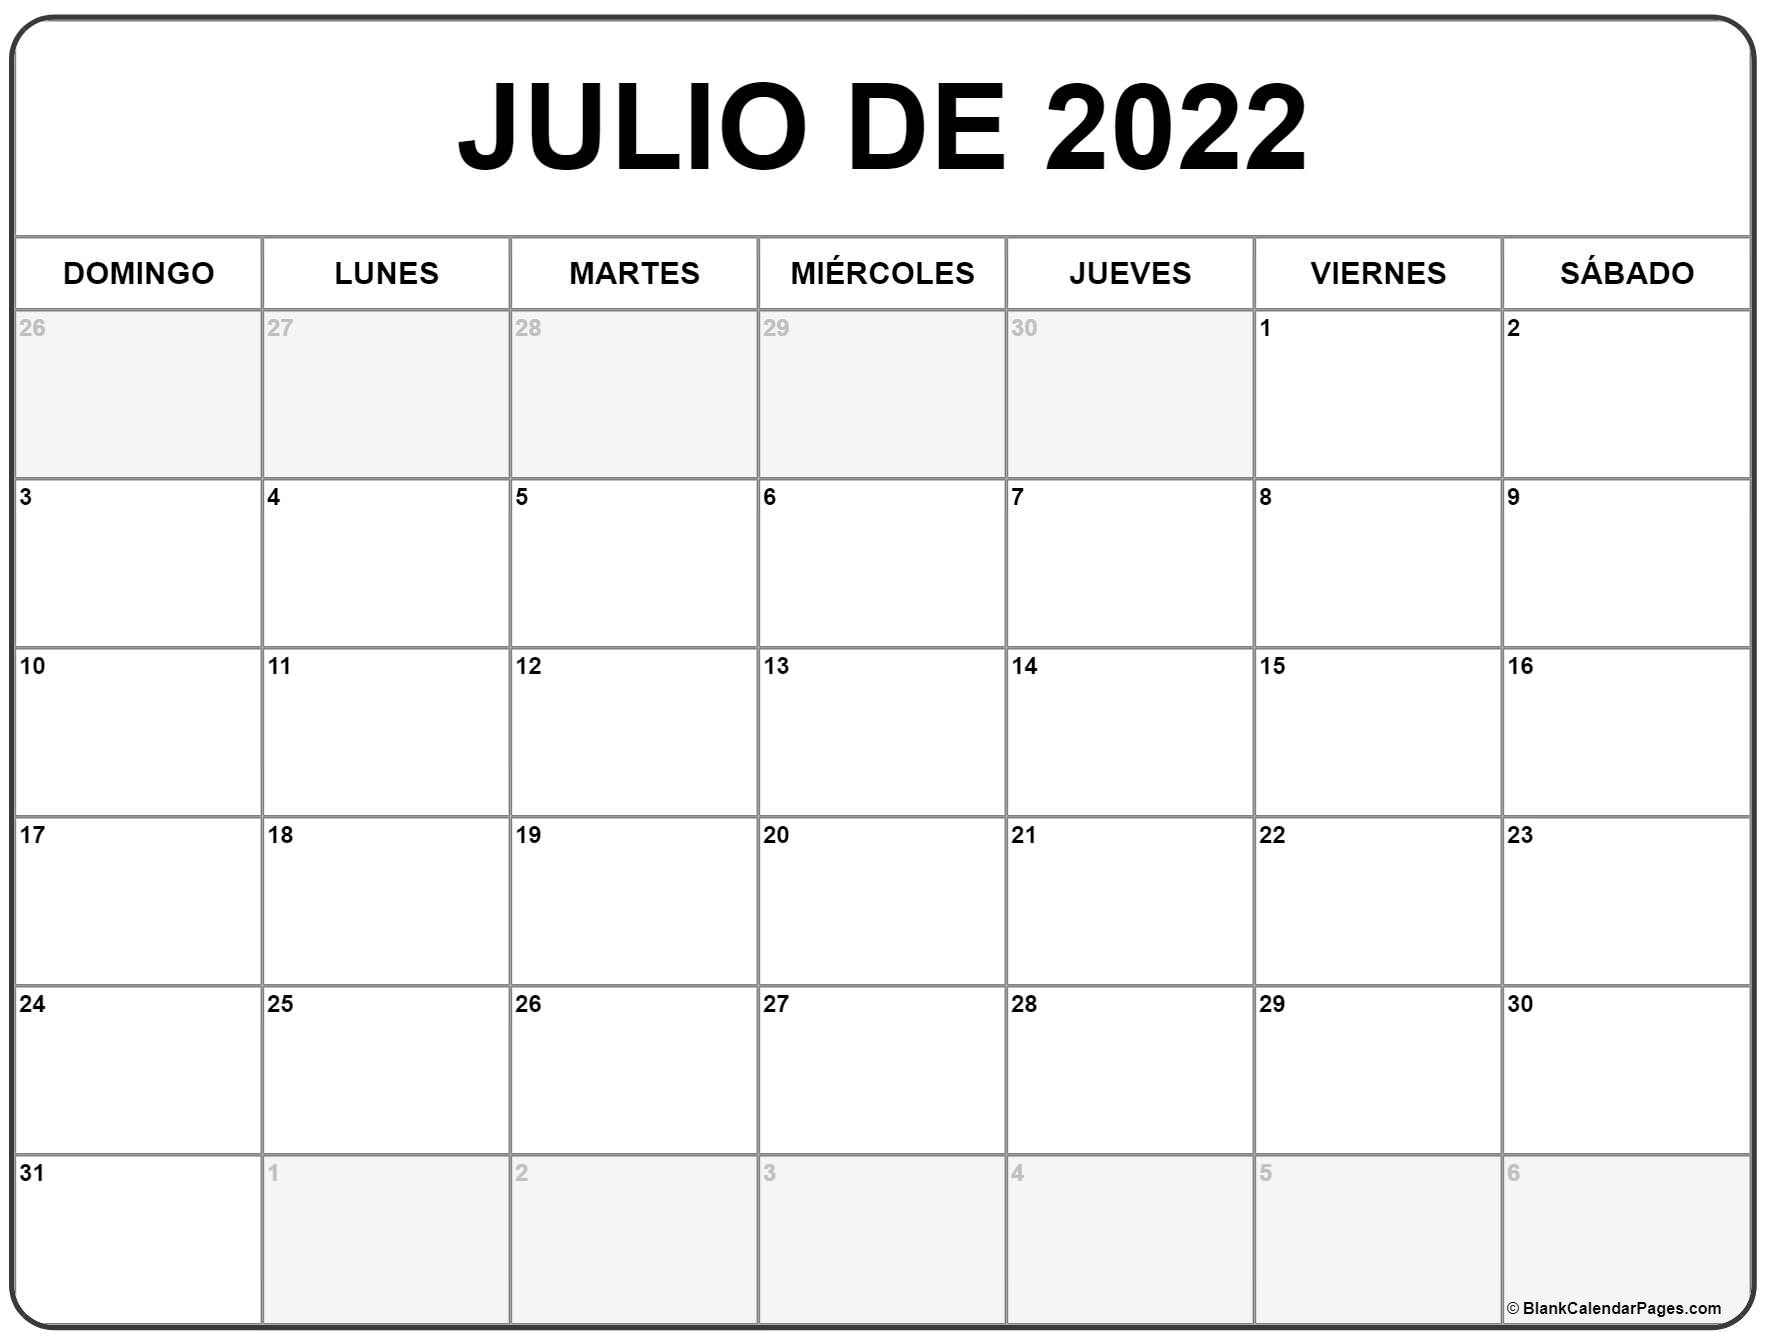 julio de 2022 calendrario